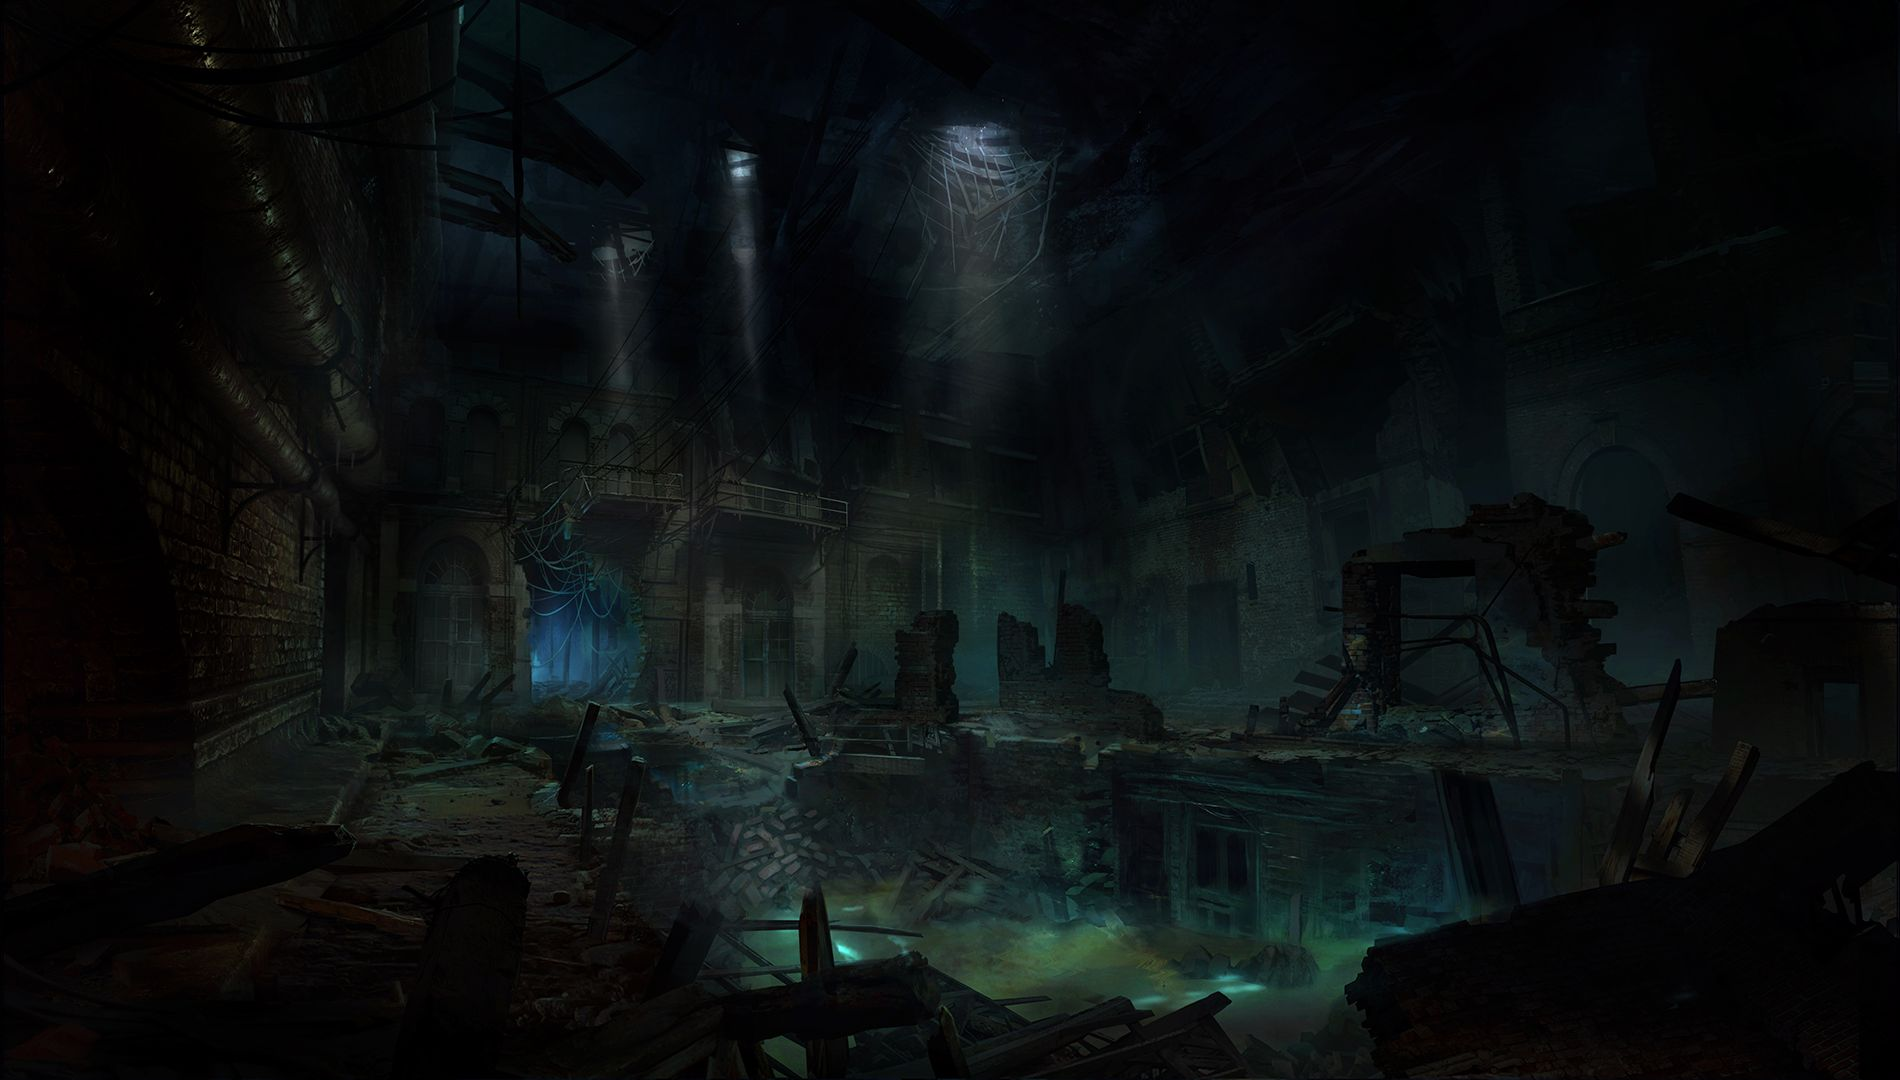 Vampire Masquerade Wallpaper Posted By Ryan Walker